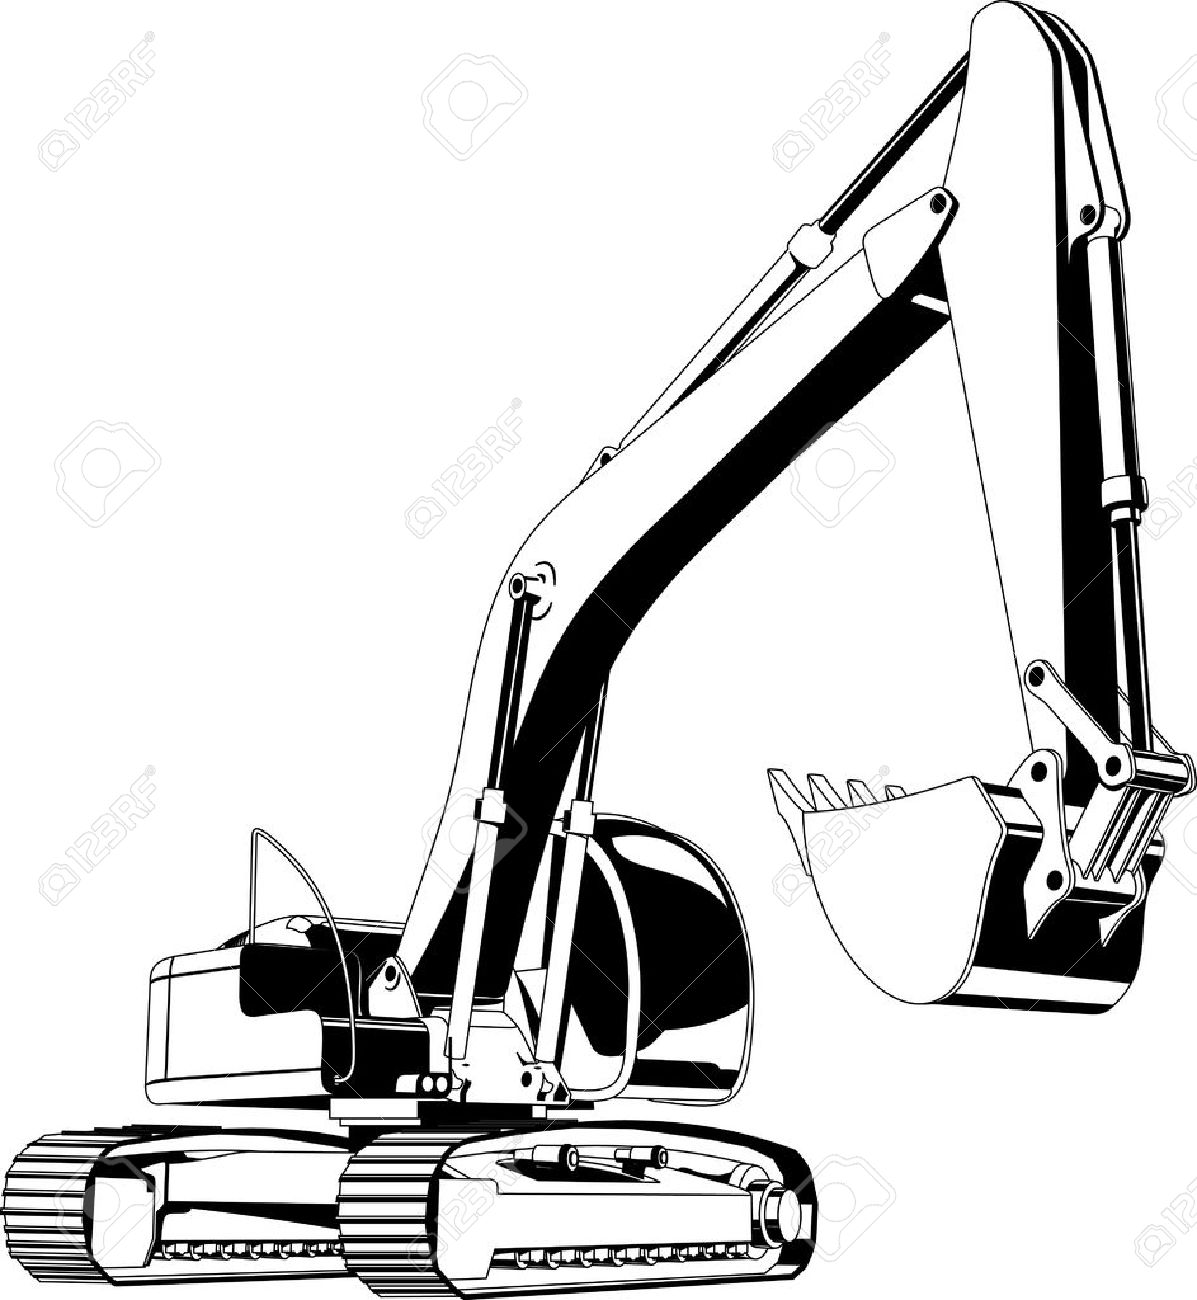 http://previews.123rf.com/images/suricoma/suricoma1001/suricoma100100002/6177502-excavator--Stock-Vector-excavator-icon-caterpillar.jpg